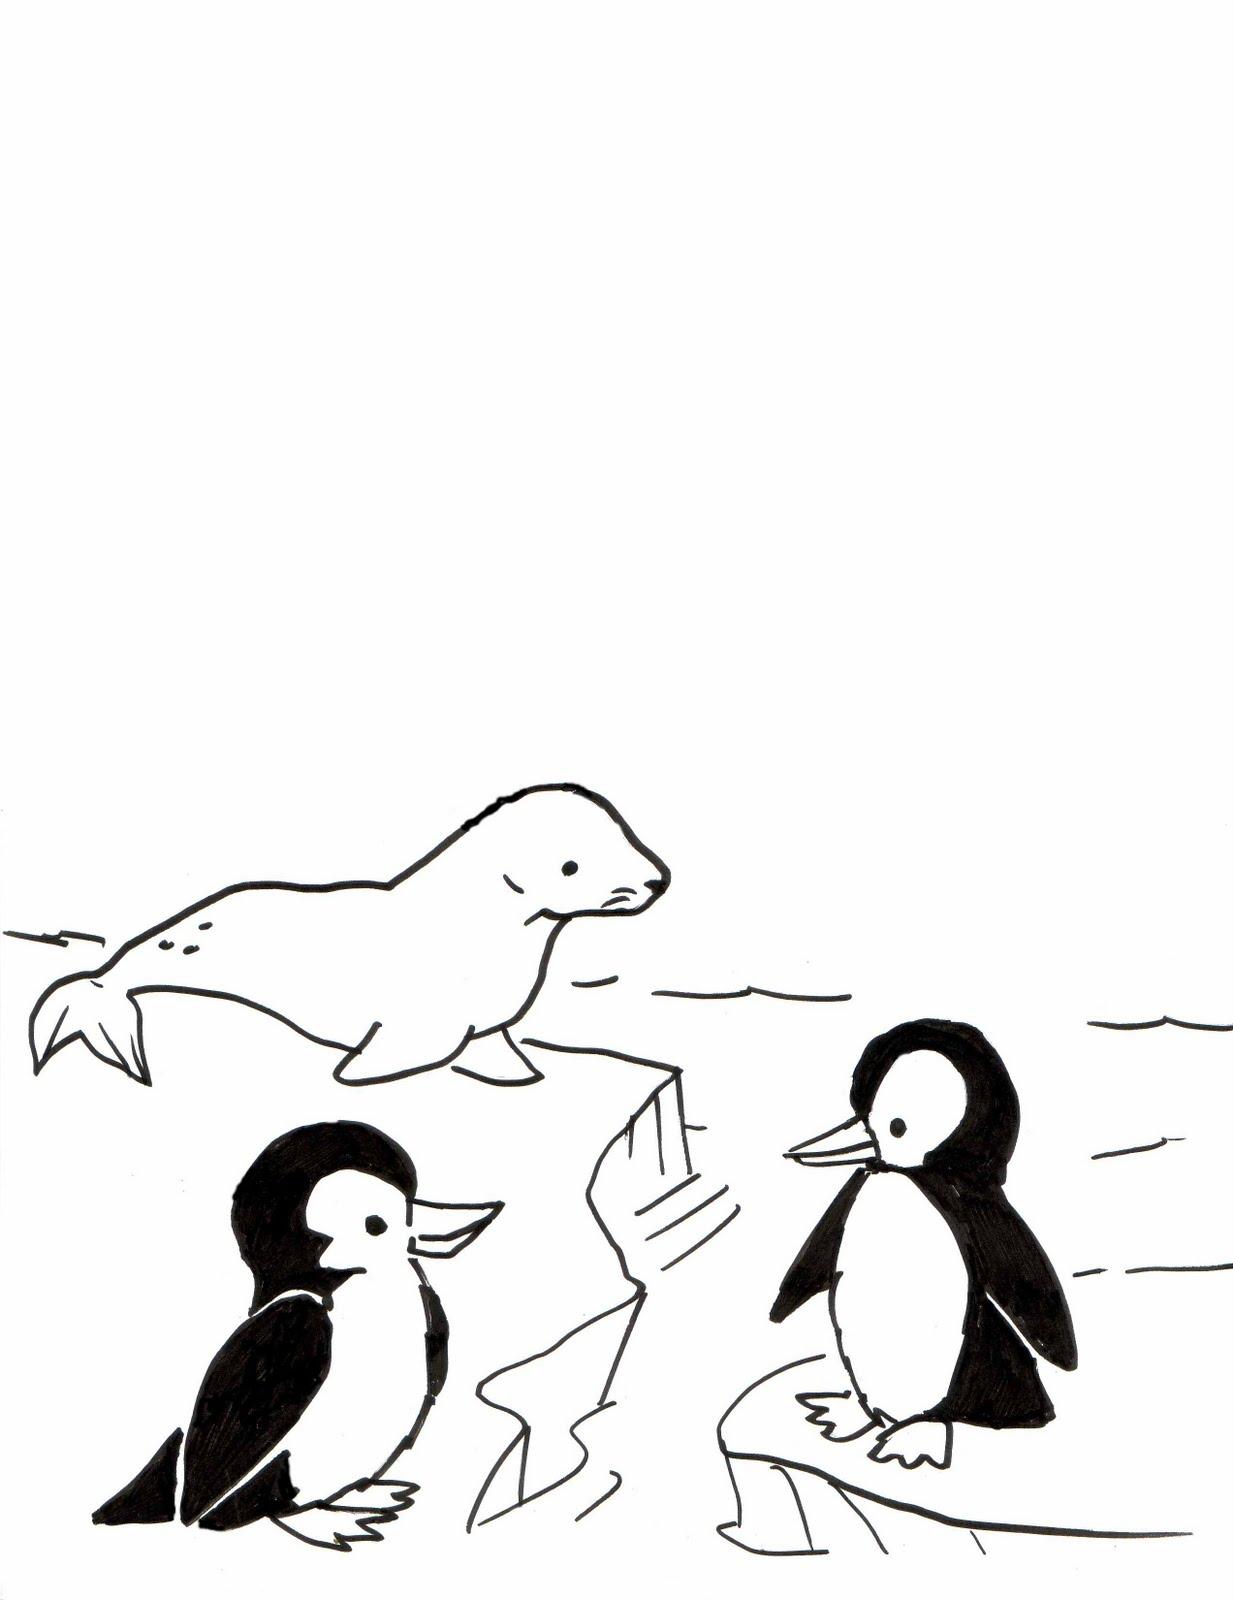 1233x1600 Kid Sketches Panda Sketching Pages